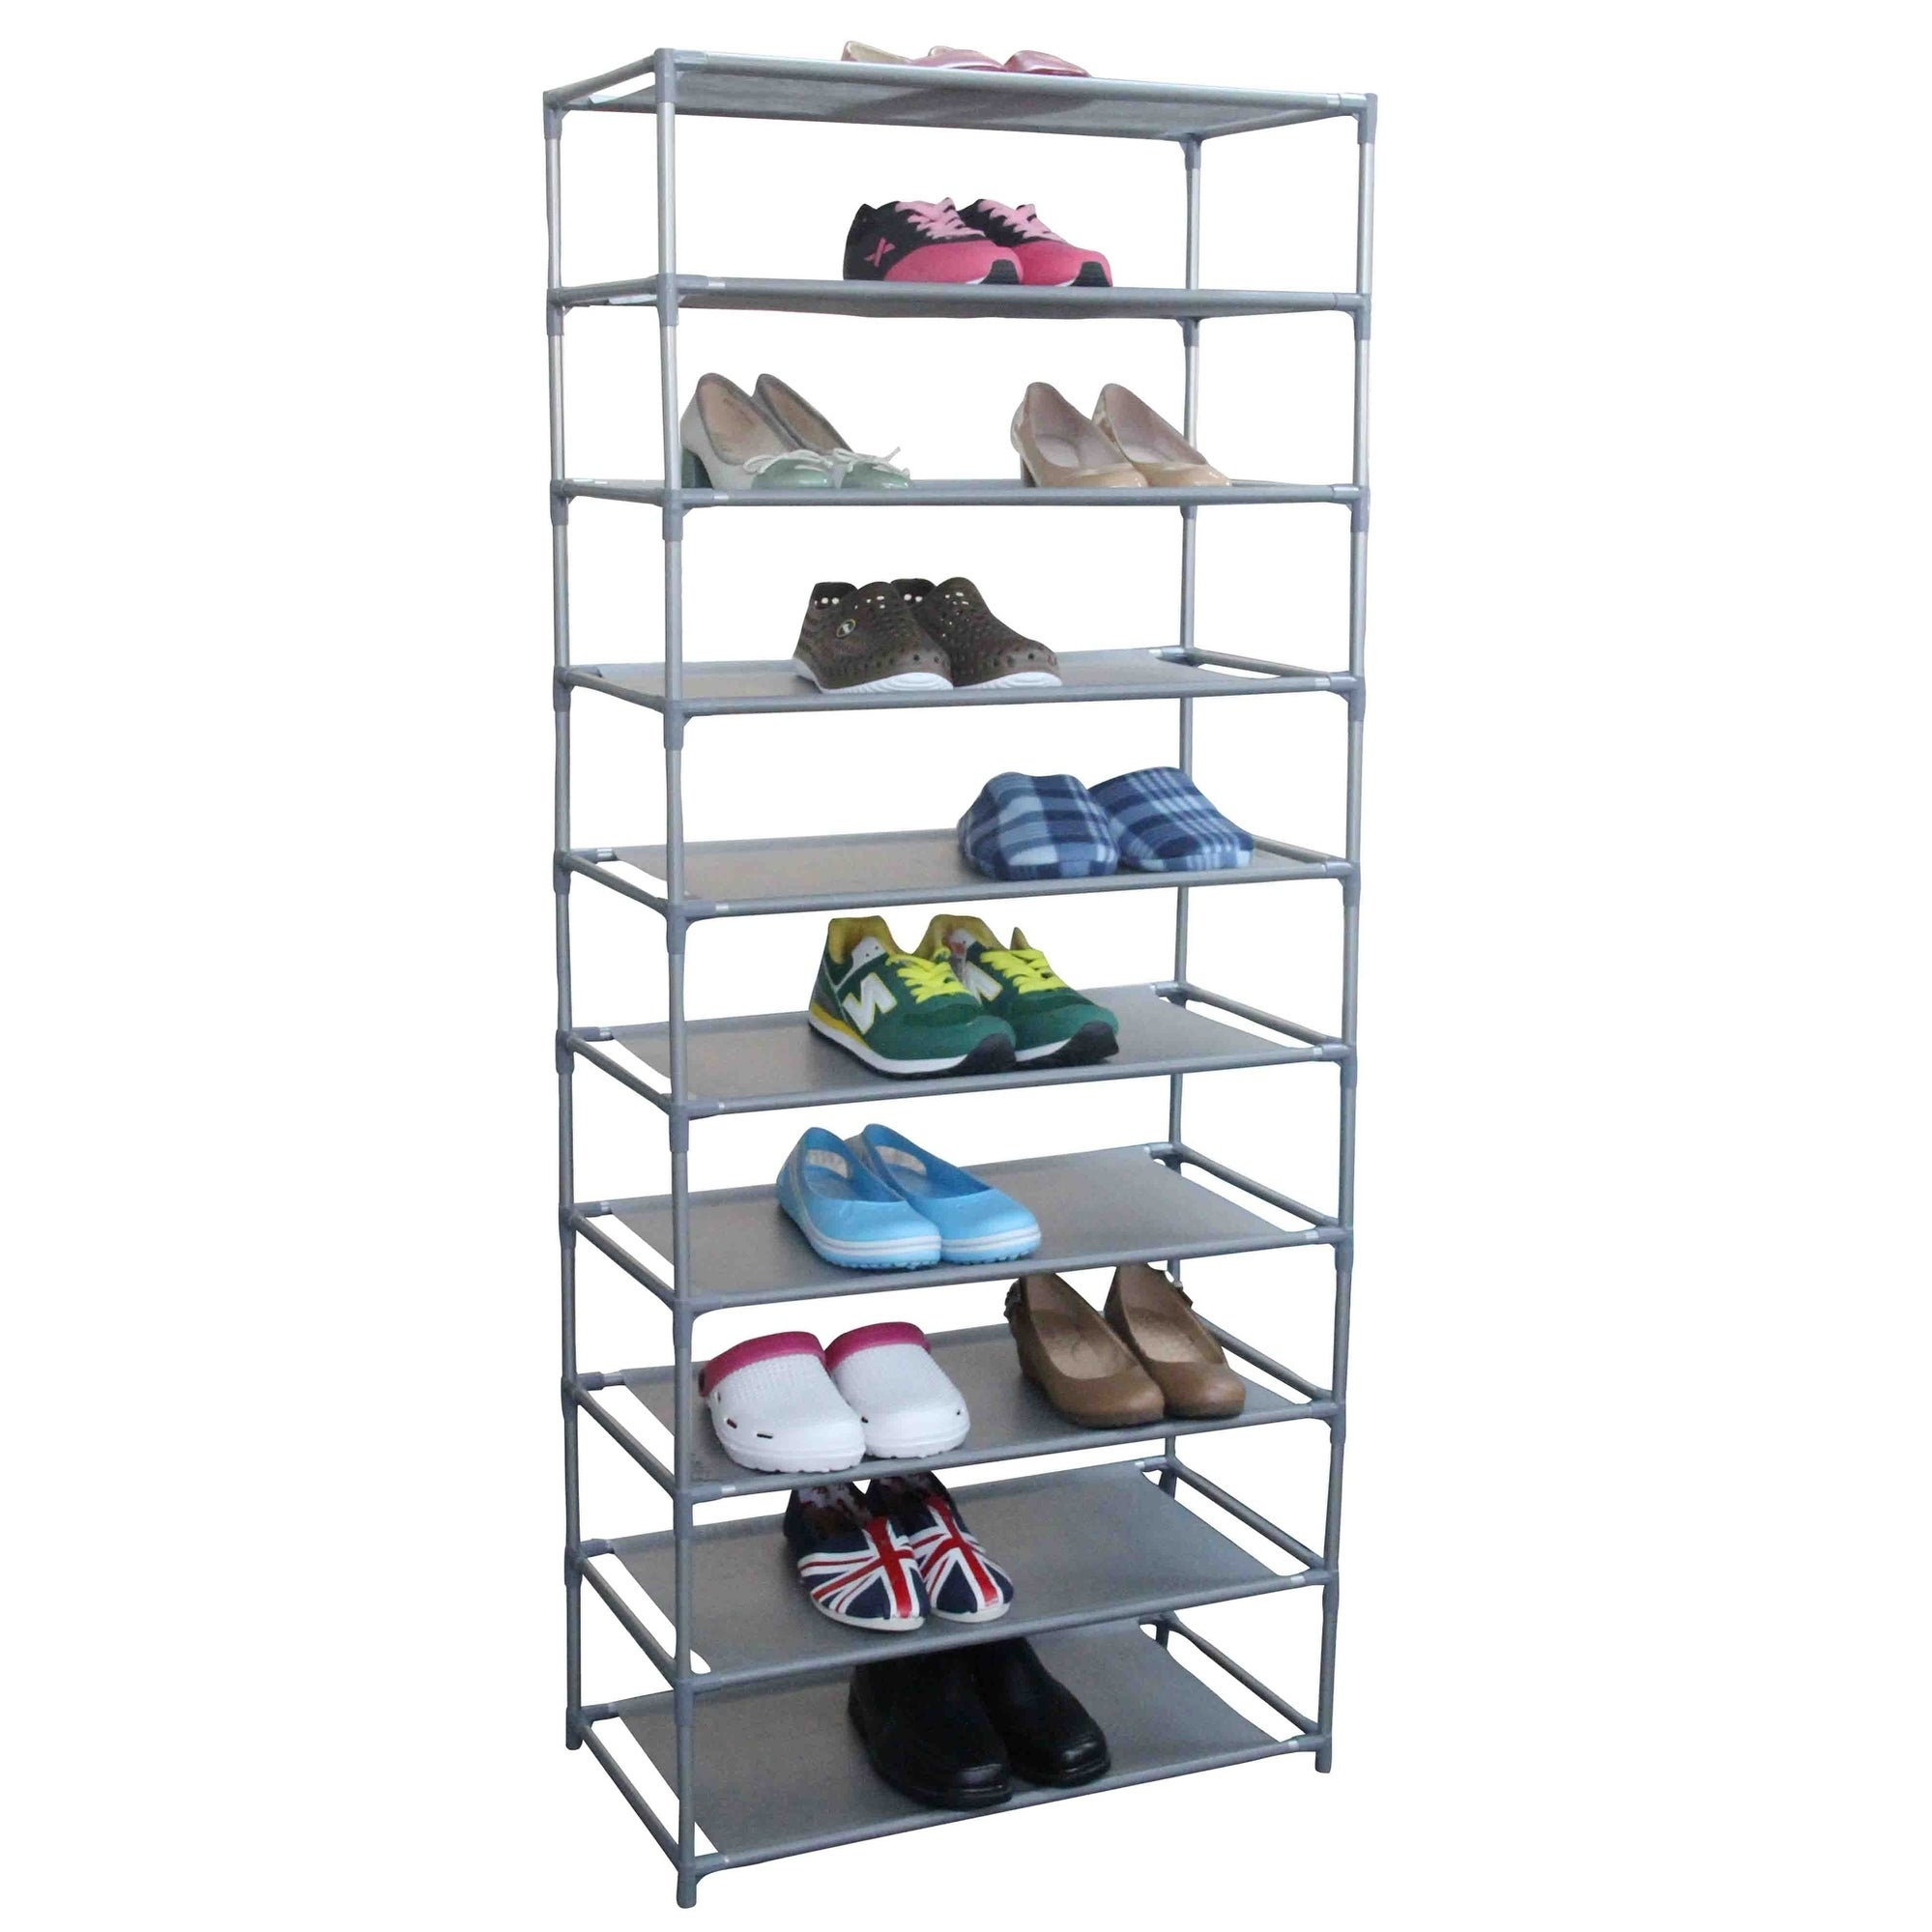 10 Tier Shoe Rack Stand Storage Organiser Home Shelf Free Standing 40 Pairs